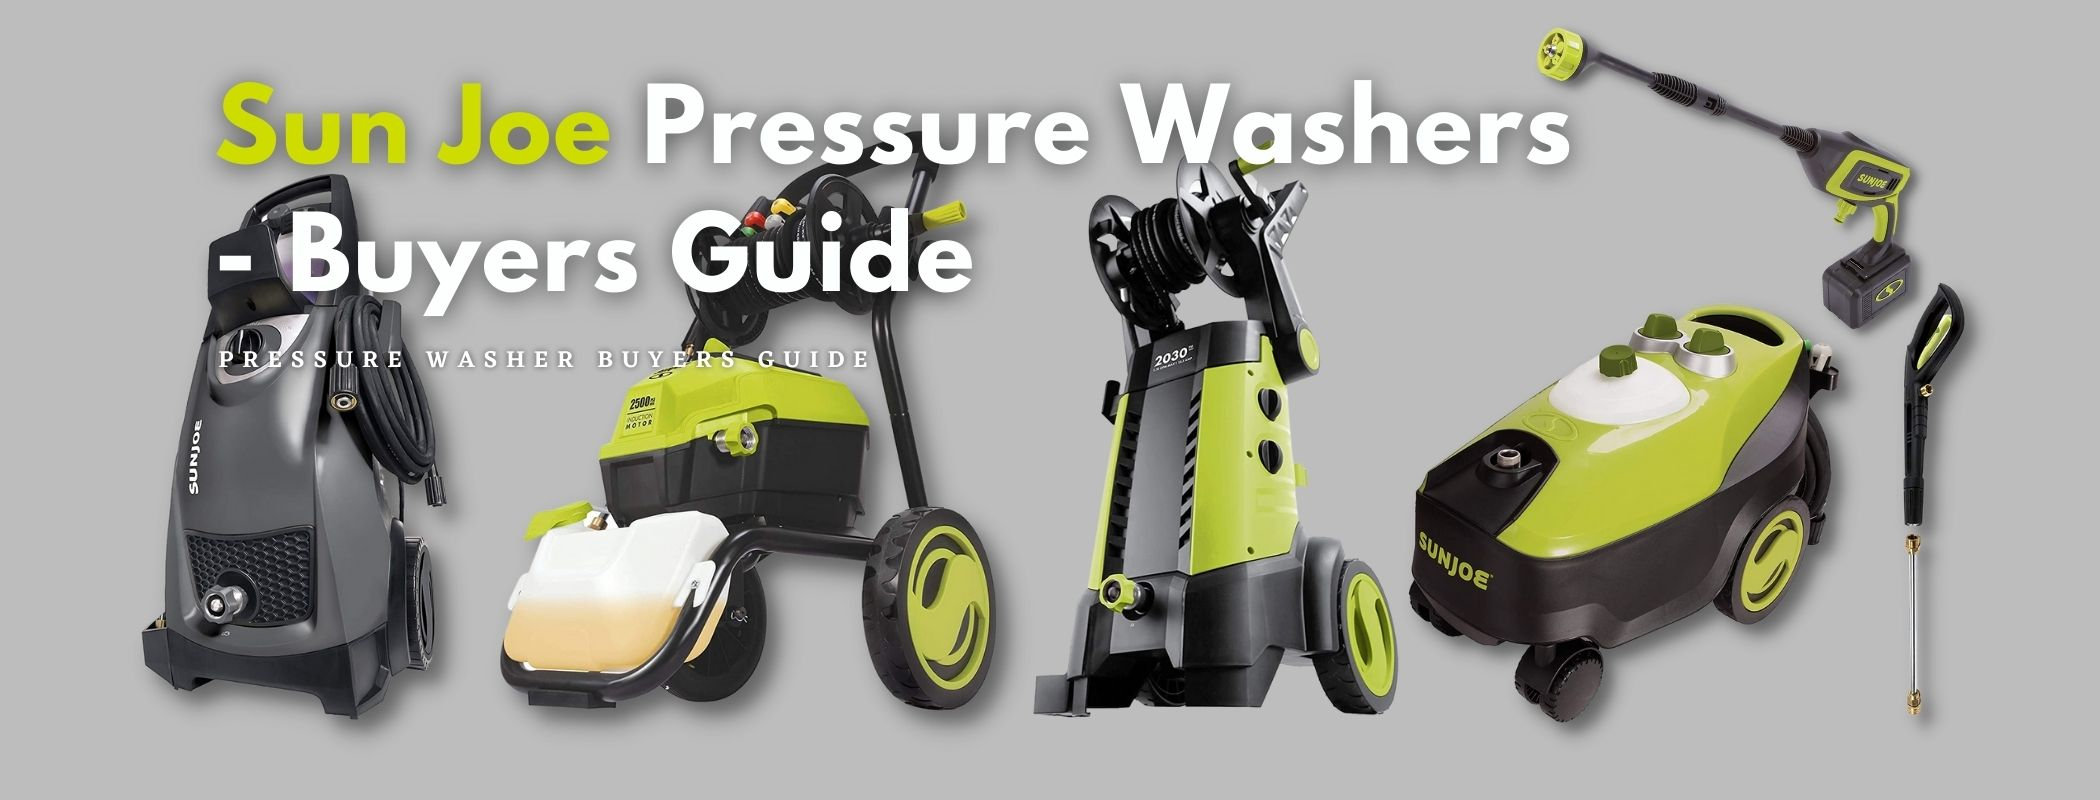 Sun Joe Pressure Washers - Buyers Guide